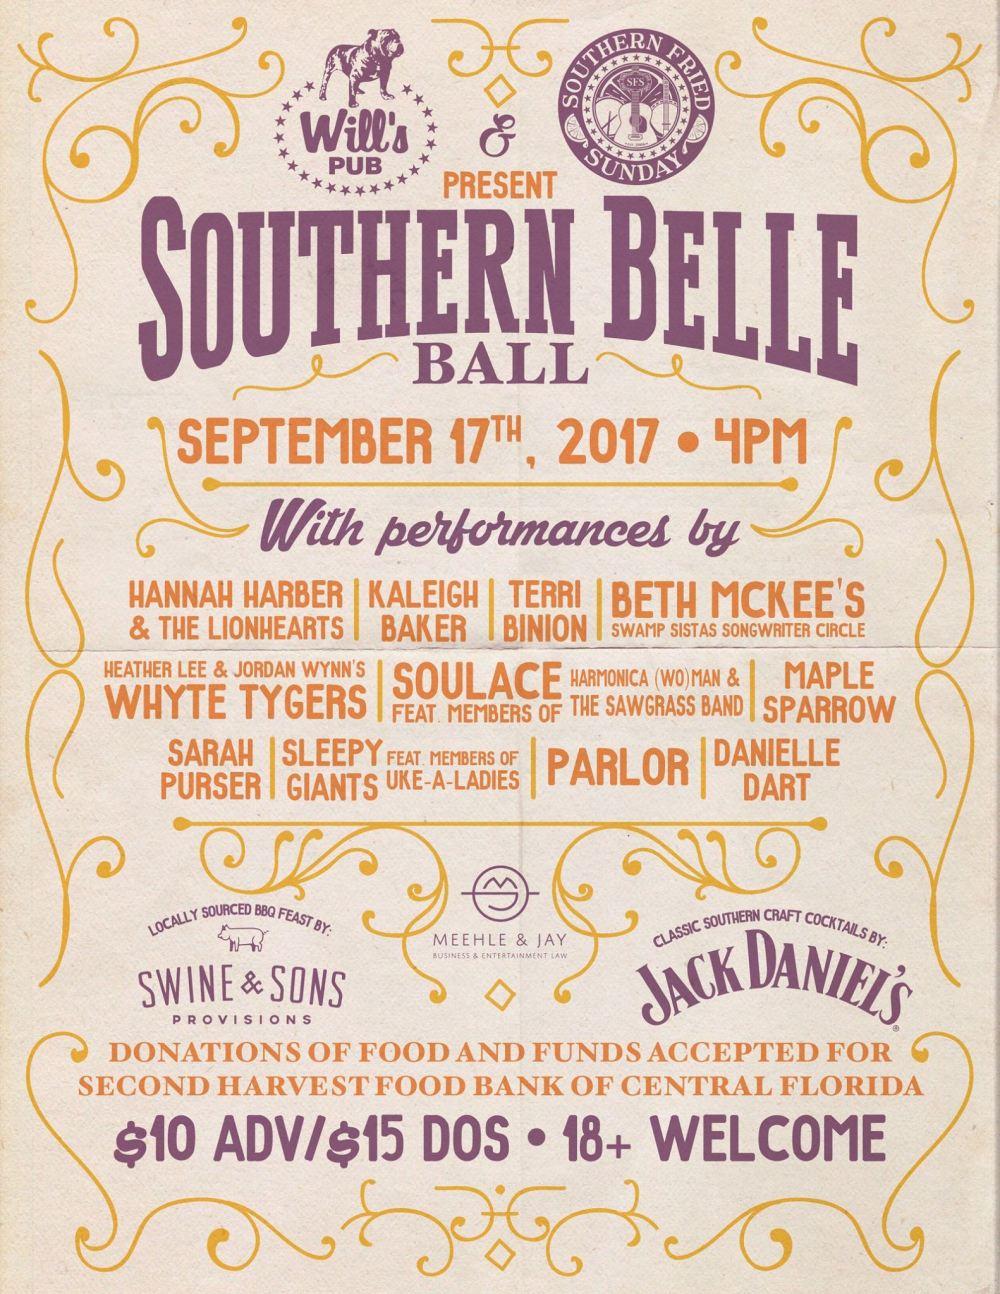 SoutherBelleball2017.jpg